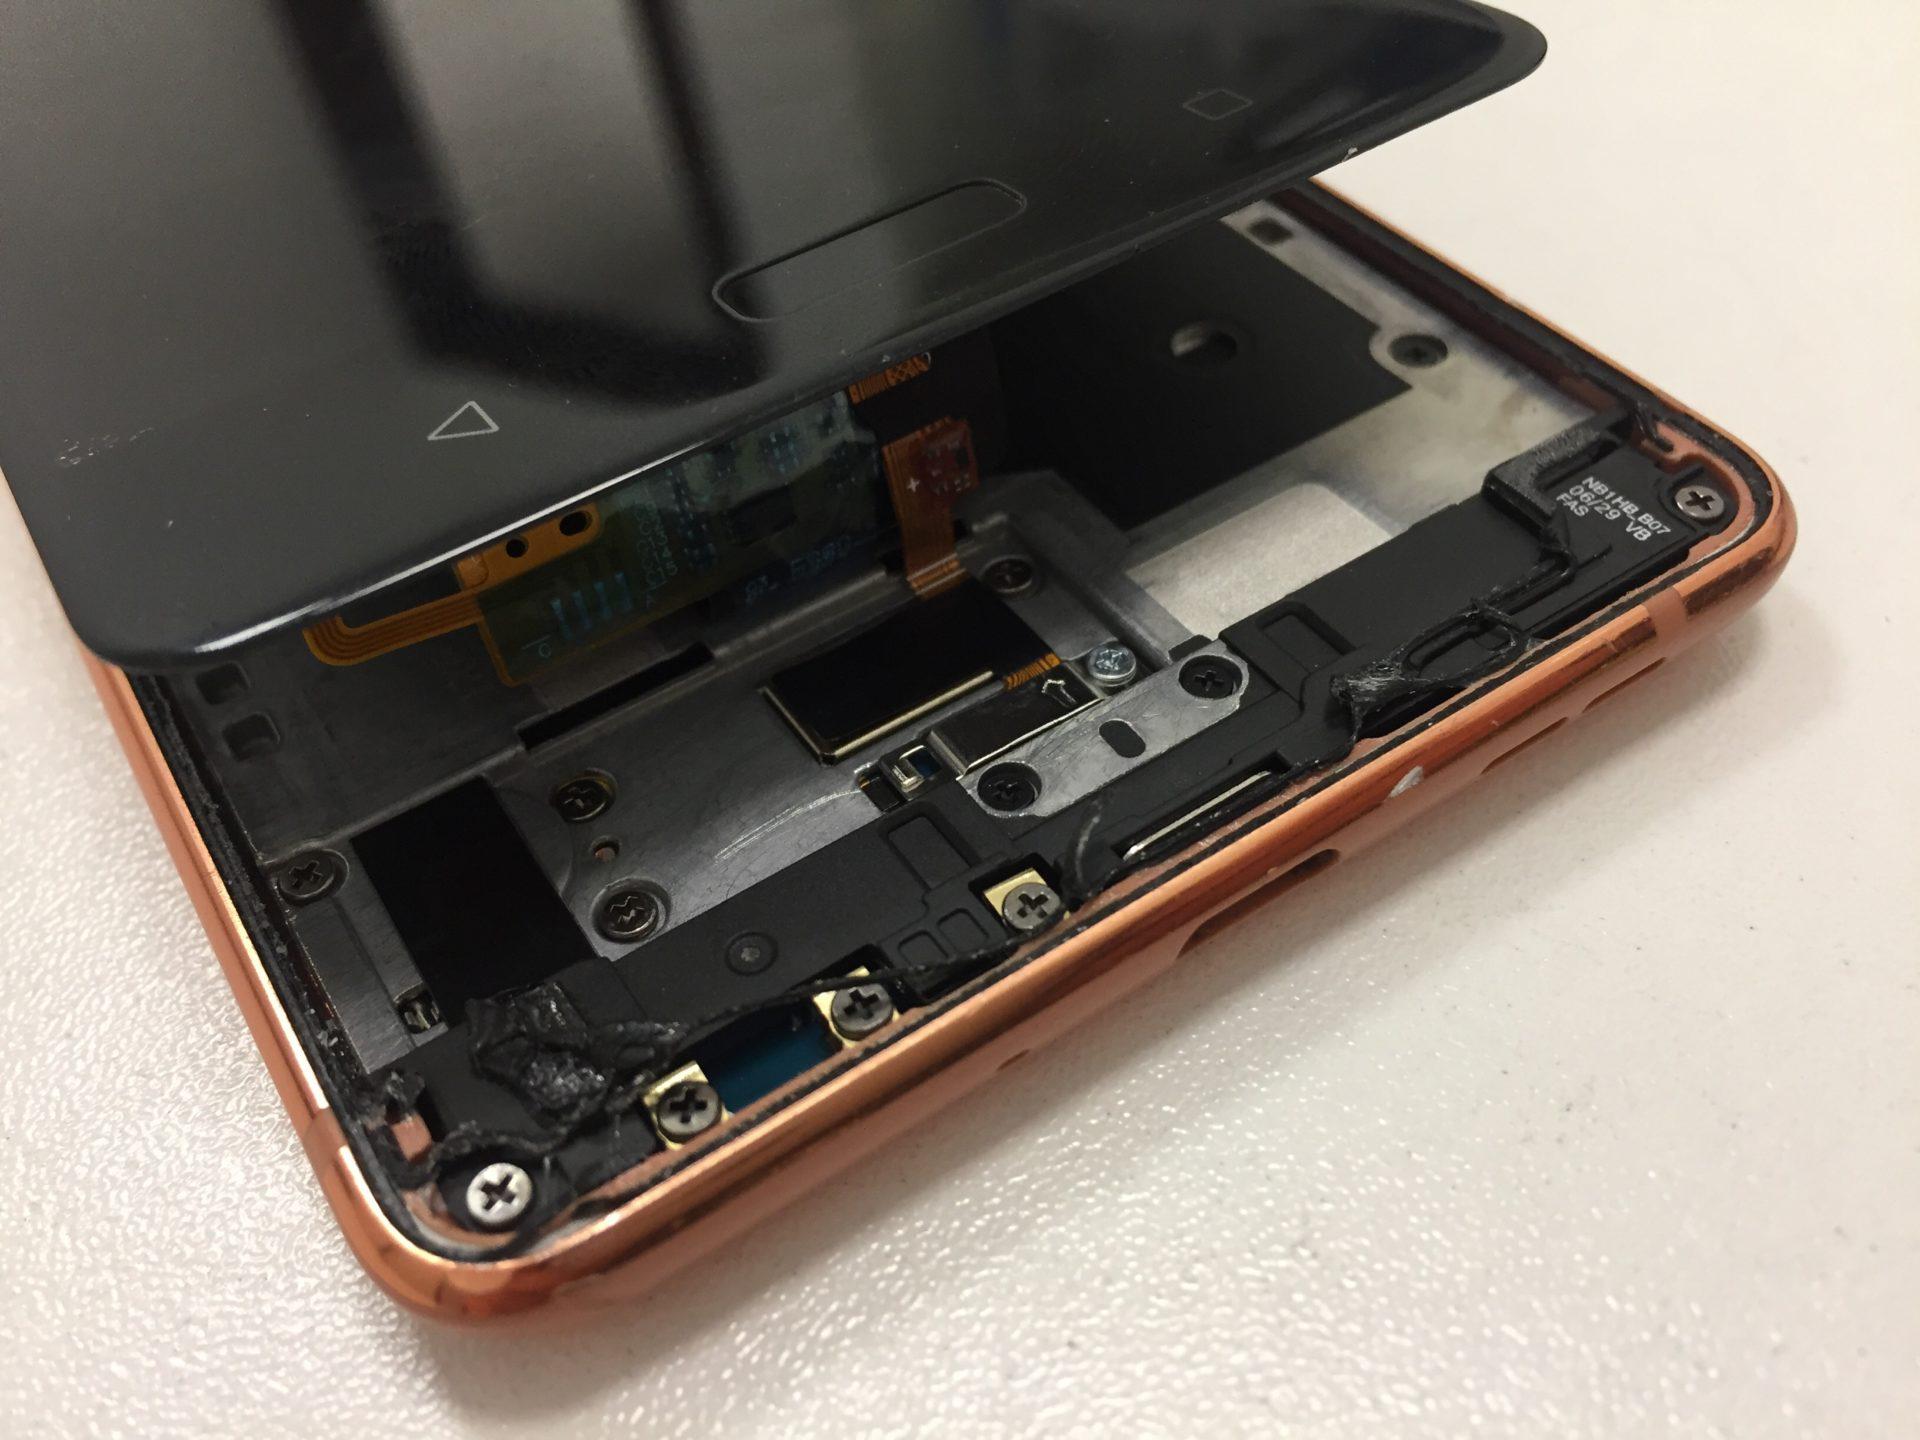 Nokia 8 TA-1004 - поменять стекло/дисплей